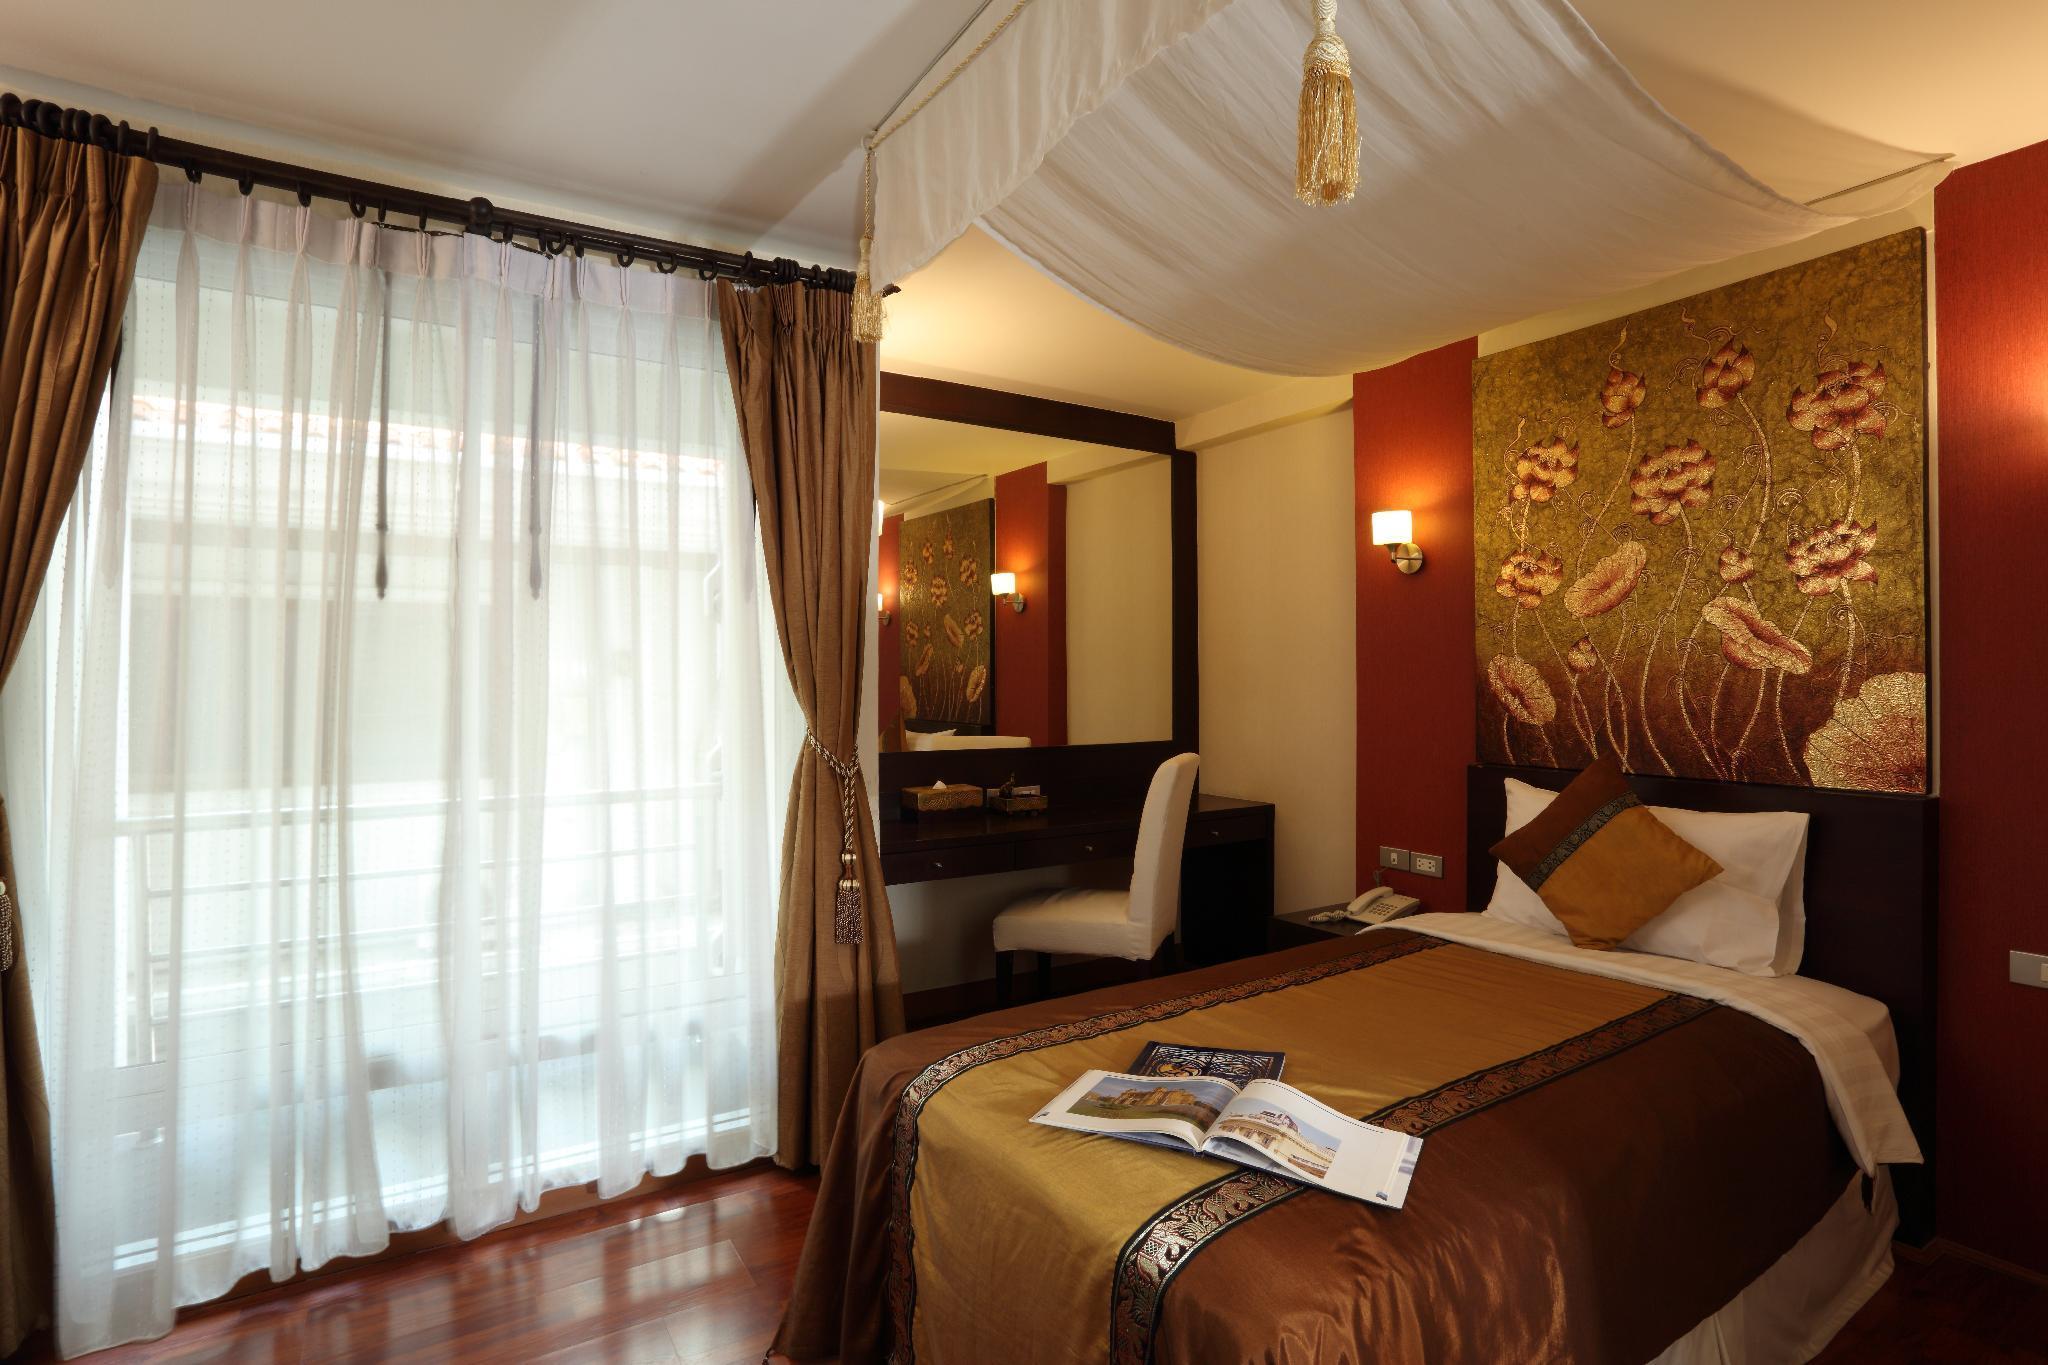 Thai style decoration room in Bkk silom อพาร์ตเมนต์ 1 ห้องนอน 1 ห้องน้ำส่วนตัว ขนาด 32 ตร.ม. – สาทร